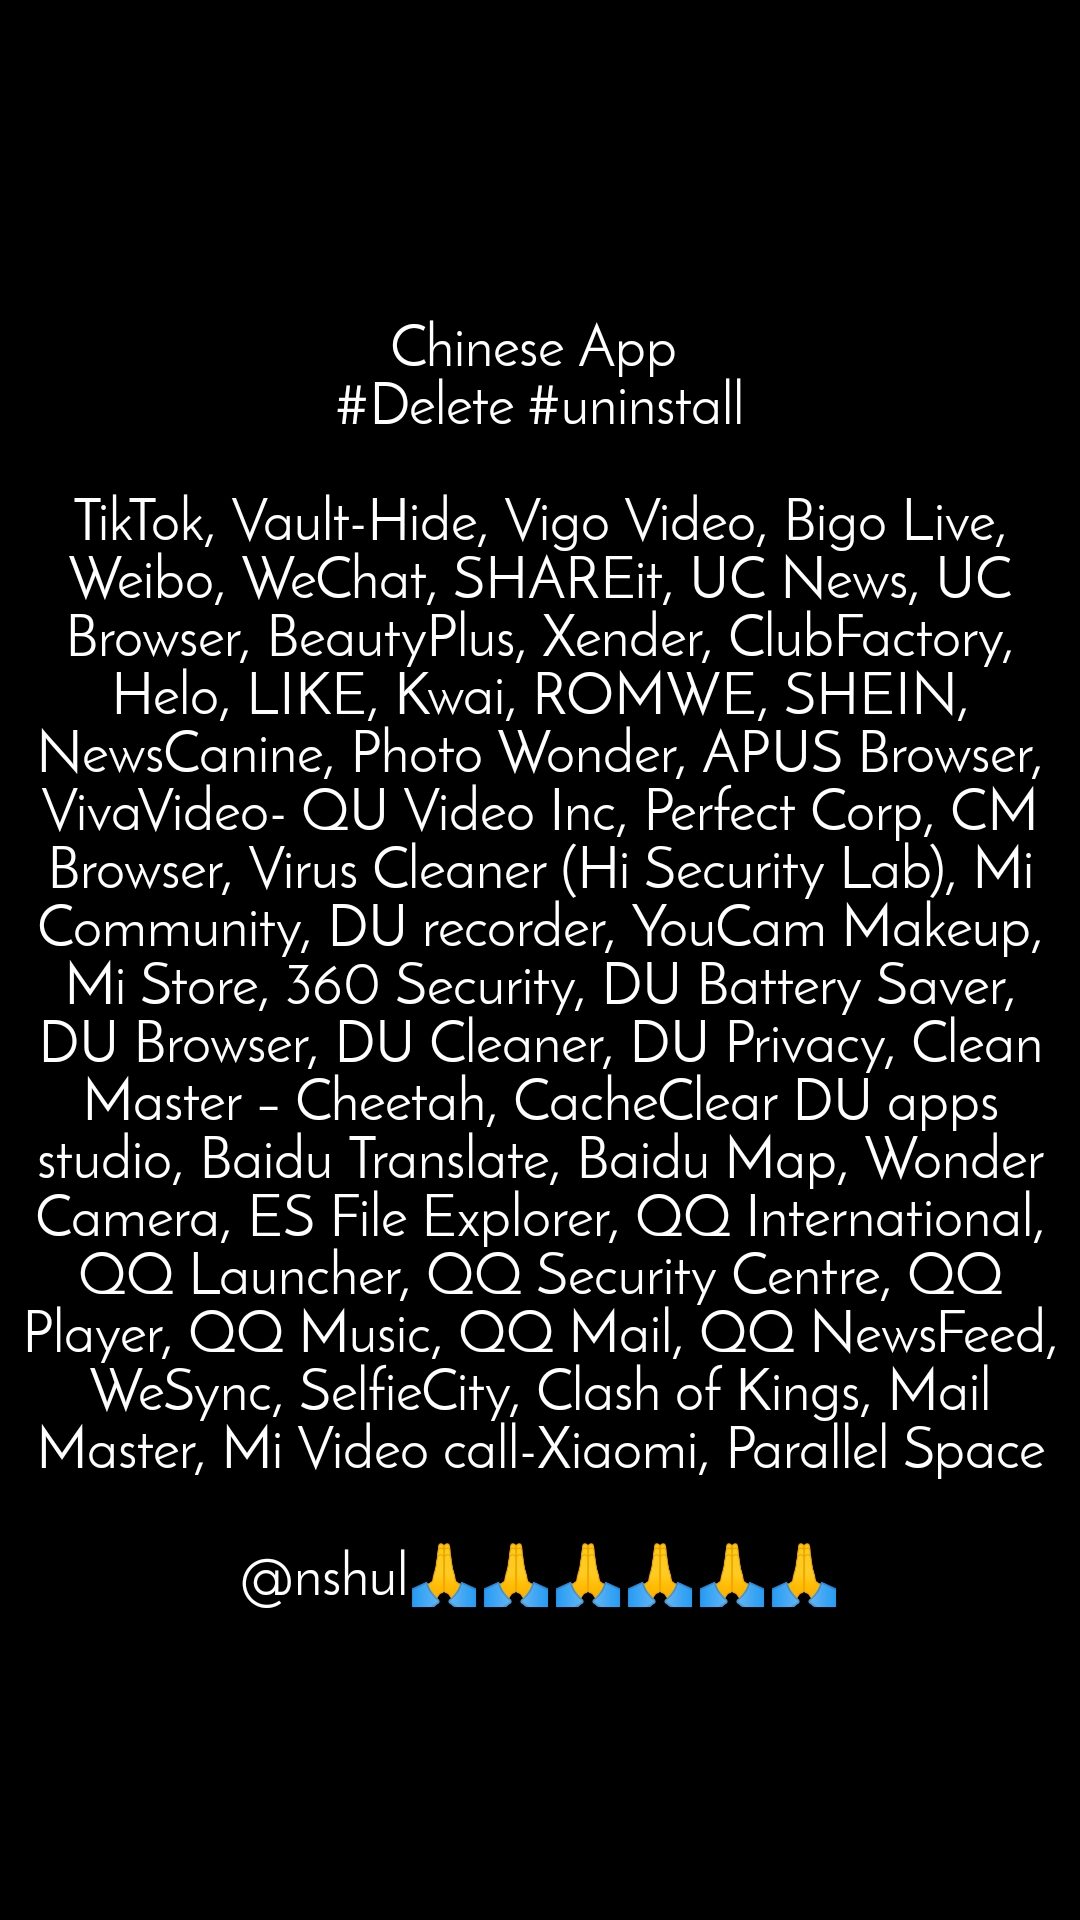 Chinese App  #Delete #uninstall  TikTok, Vault-Hide, Vigo Video, Bigo Live, Weibo, WeChat, SHAREit, UC News, UC Browser, BeautyPlus, Xender, ClubFactory, Helo, LIKE, Kwai, ROMWE, SHEIN, NewsCanine, Photo Wonder, APUS Browser, VivaVideo- QU Video Inc, Perfect Corp, CM Browser, Virus Cleaner (Hi Security Lab), Mi Community, DU recorder, YouCam Makeup, Mi Store, 360 Security, DU Battery Saver, DU Browser, DU Cleaner, DU Privacy, Clean Master – Cheetah, CacheClear DU apps studio, Baidu Translate, Baidu Map, Wonder Camera, ES File Explorer, QQ International, QQ Launcher, QQ Security Centre, QQ Player, QQ Music, QQ Mail, QQ NewsFeed, WeSync, SelfieCity, Clash of Kings, Mail Master, Mi Video call-Xiaomi, Parallel Space  @nshul🙏🙏🙏🙏🙏🙏